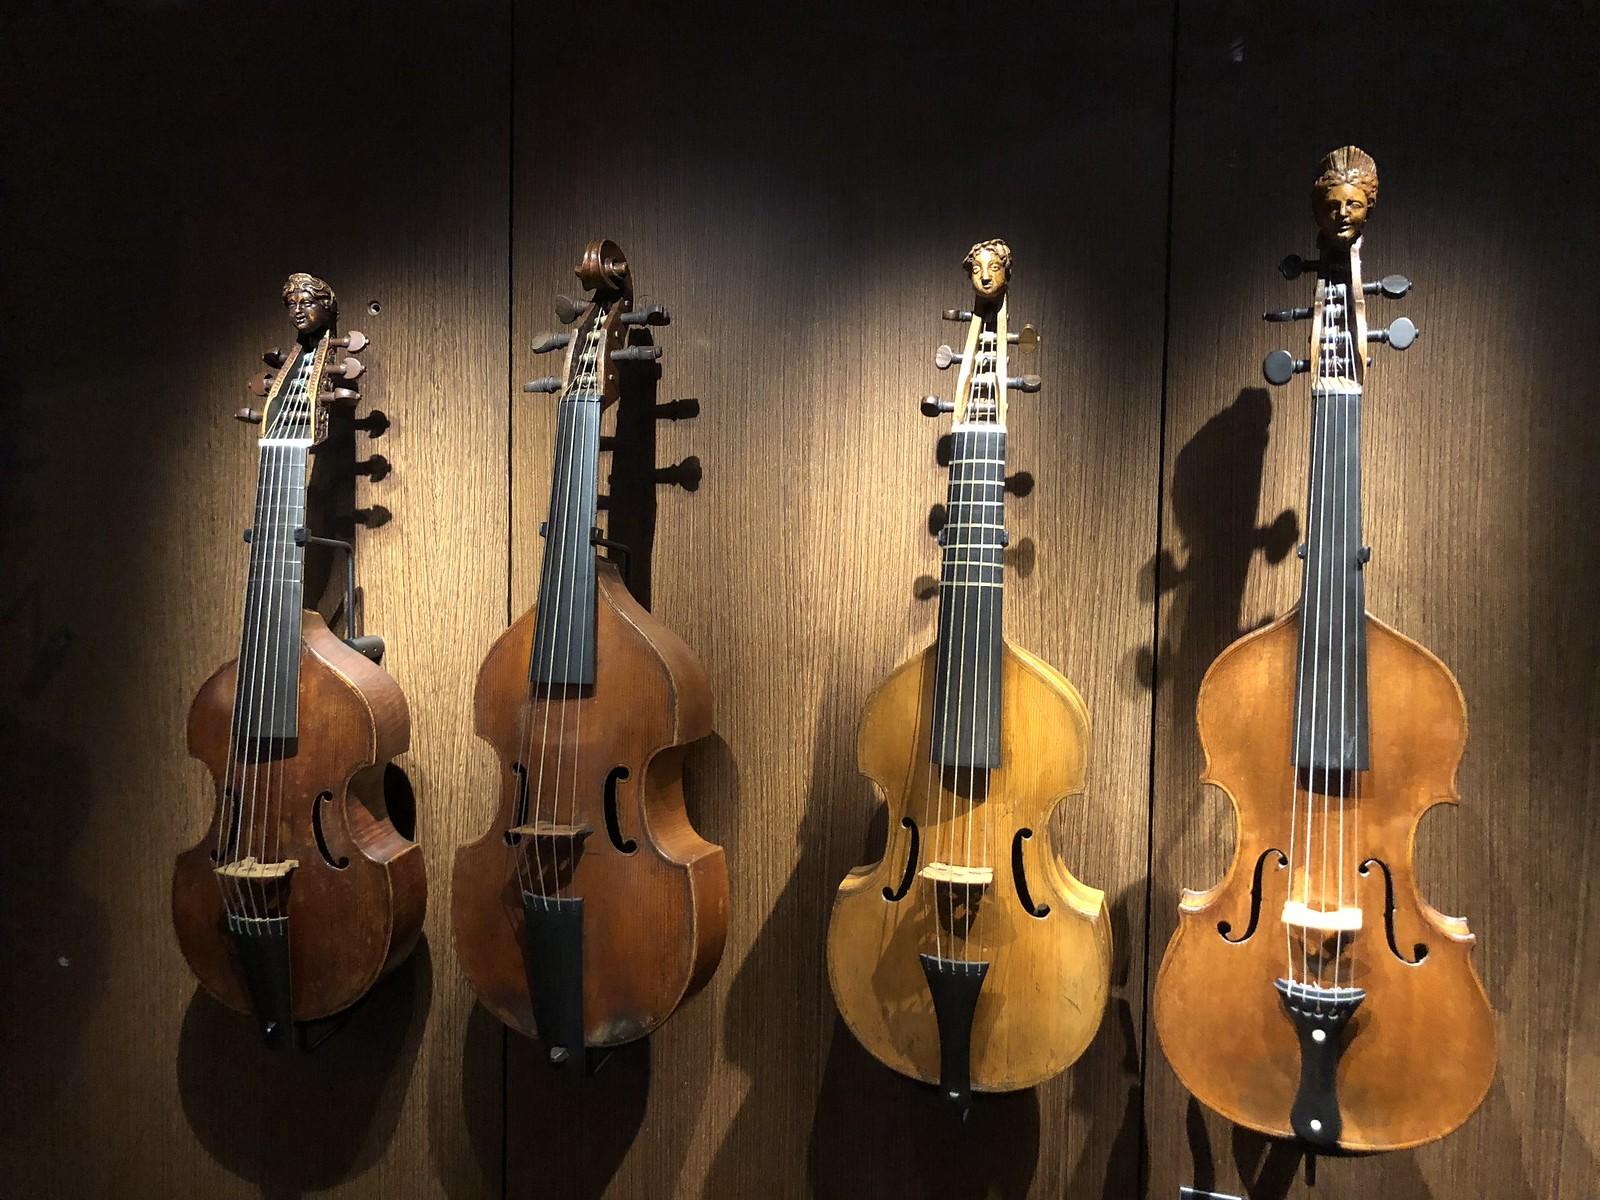 Colección de violas da gamba